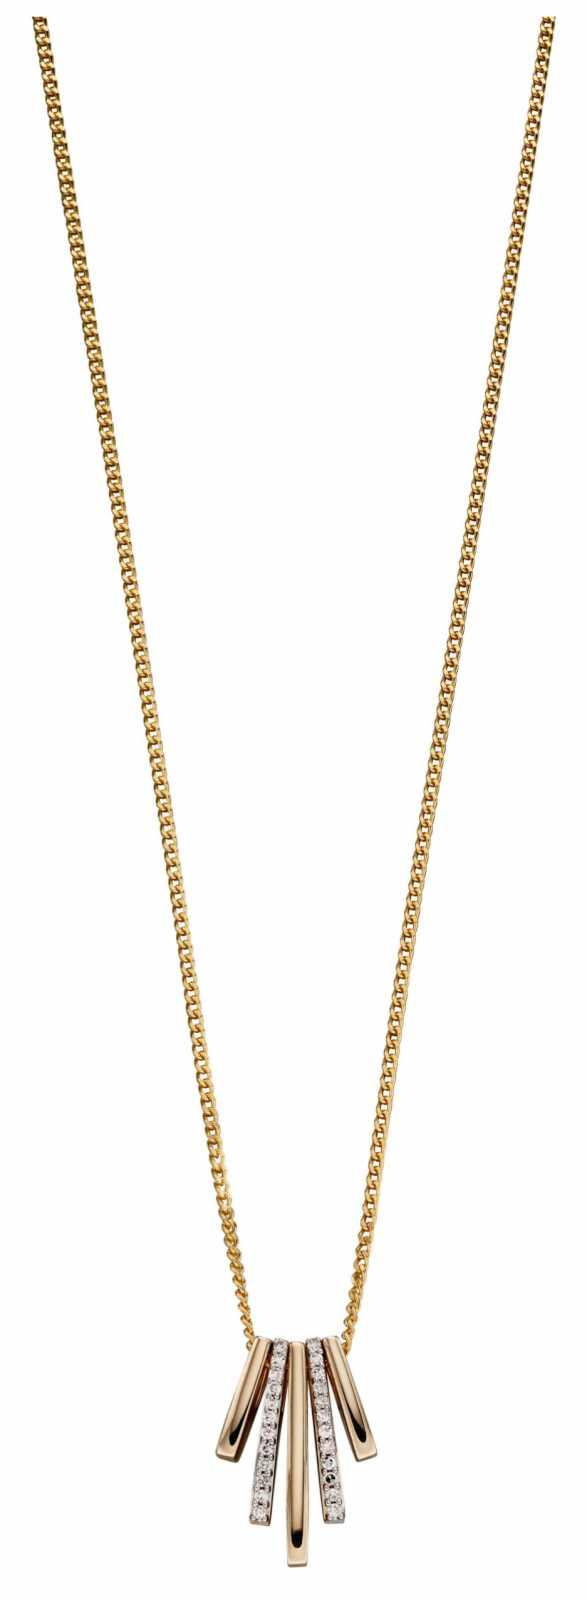 Elements Gold 9k Yellow Gold Geometric Diamond Stick Drop Pendant Only GP2181